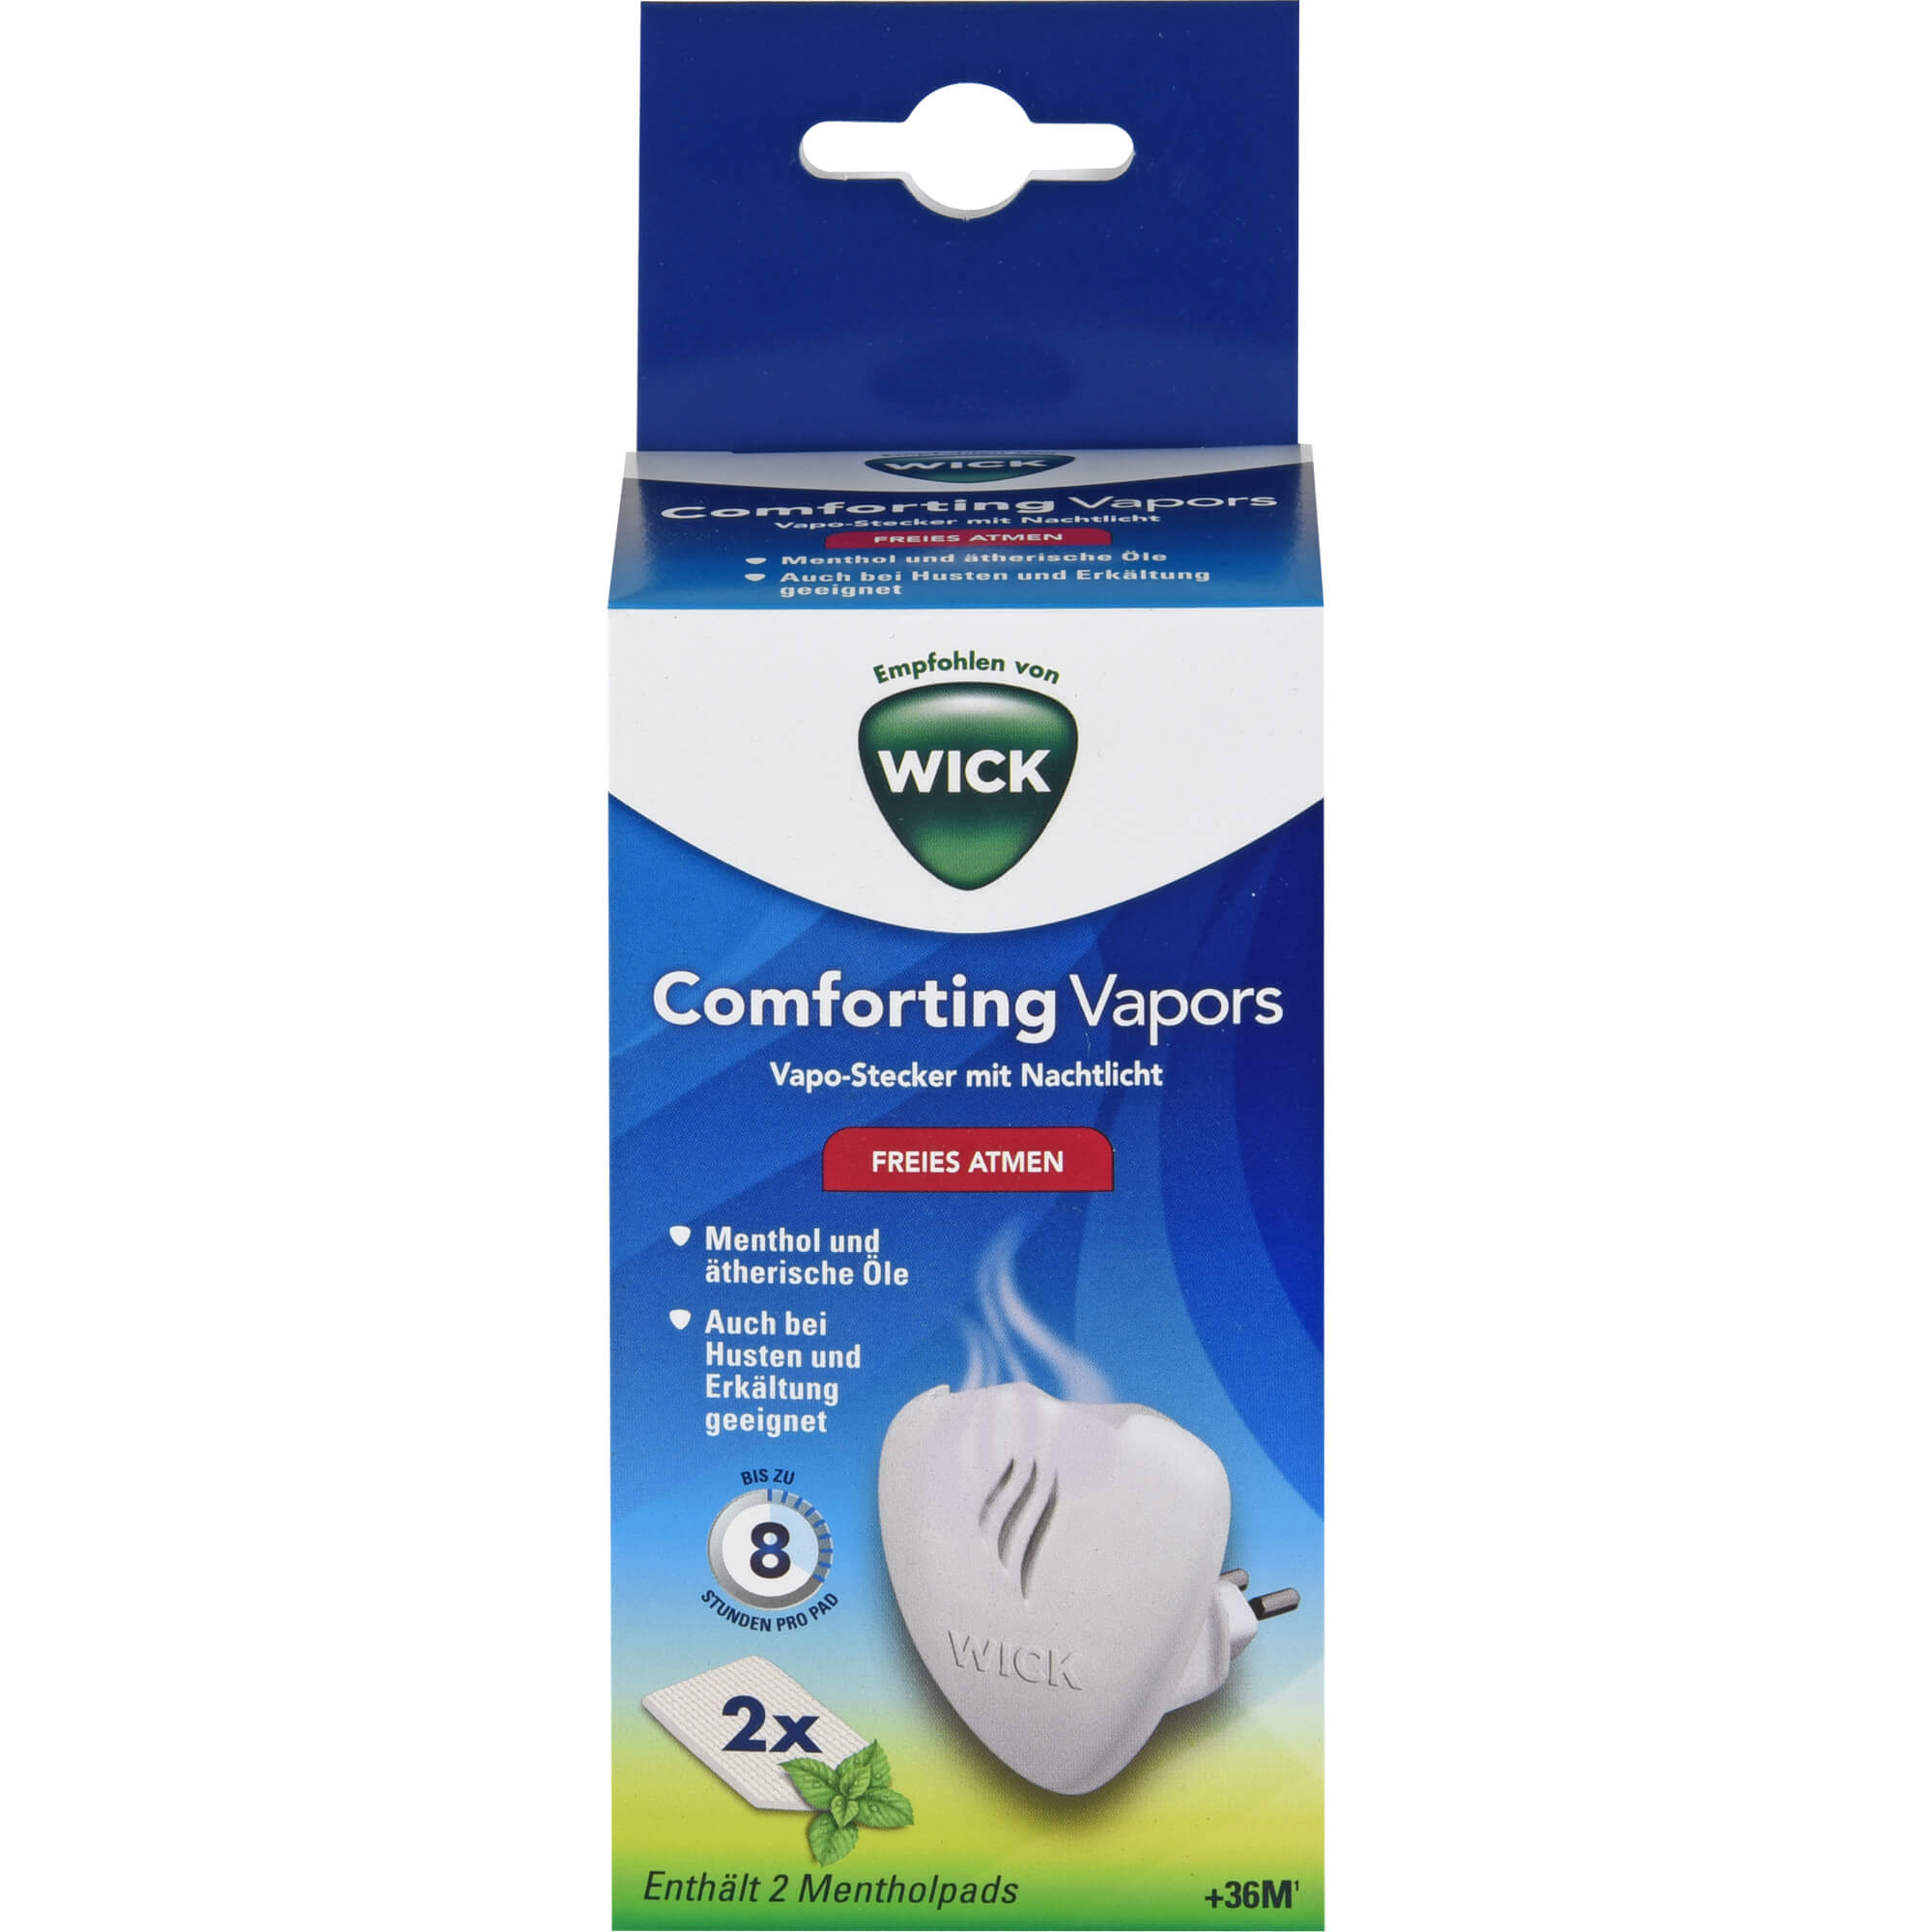 WICK Comfort.Vapors Vapo Stecker ink.5 Duftpad